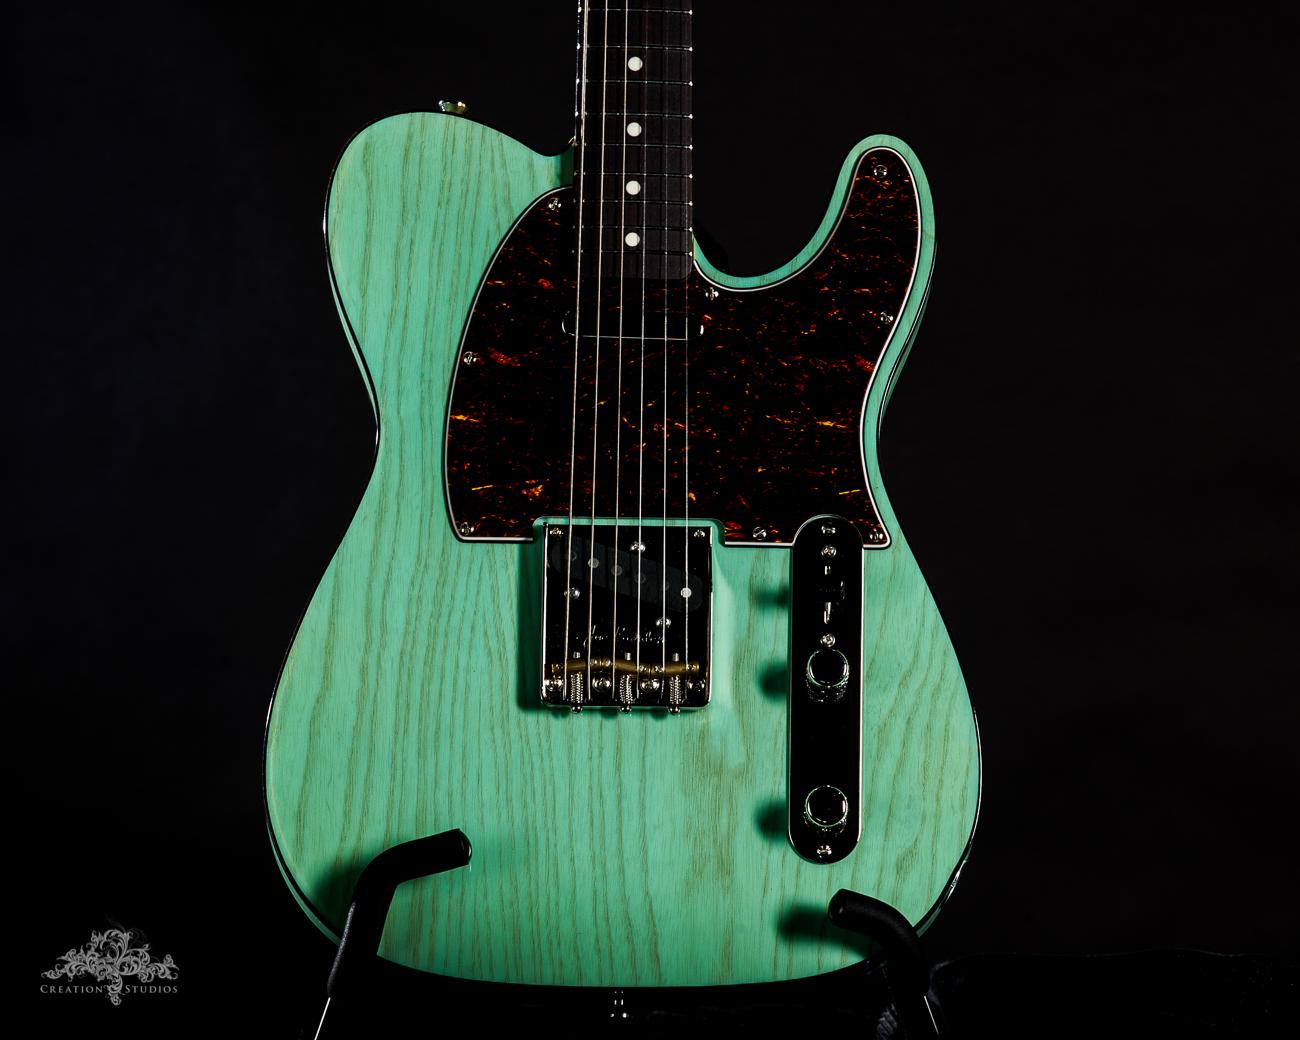 CreationStudios-Guitar-Memphis-002-DSC_9069